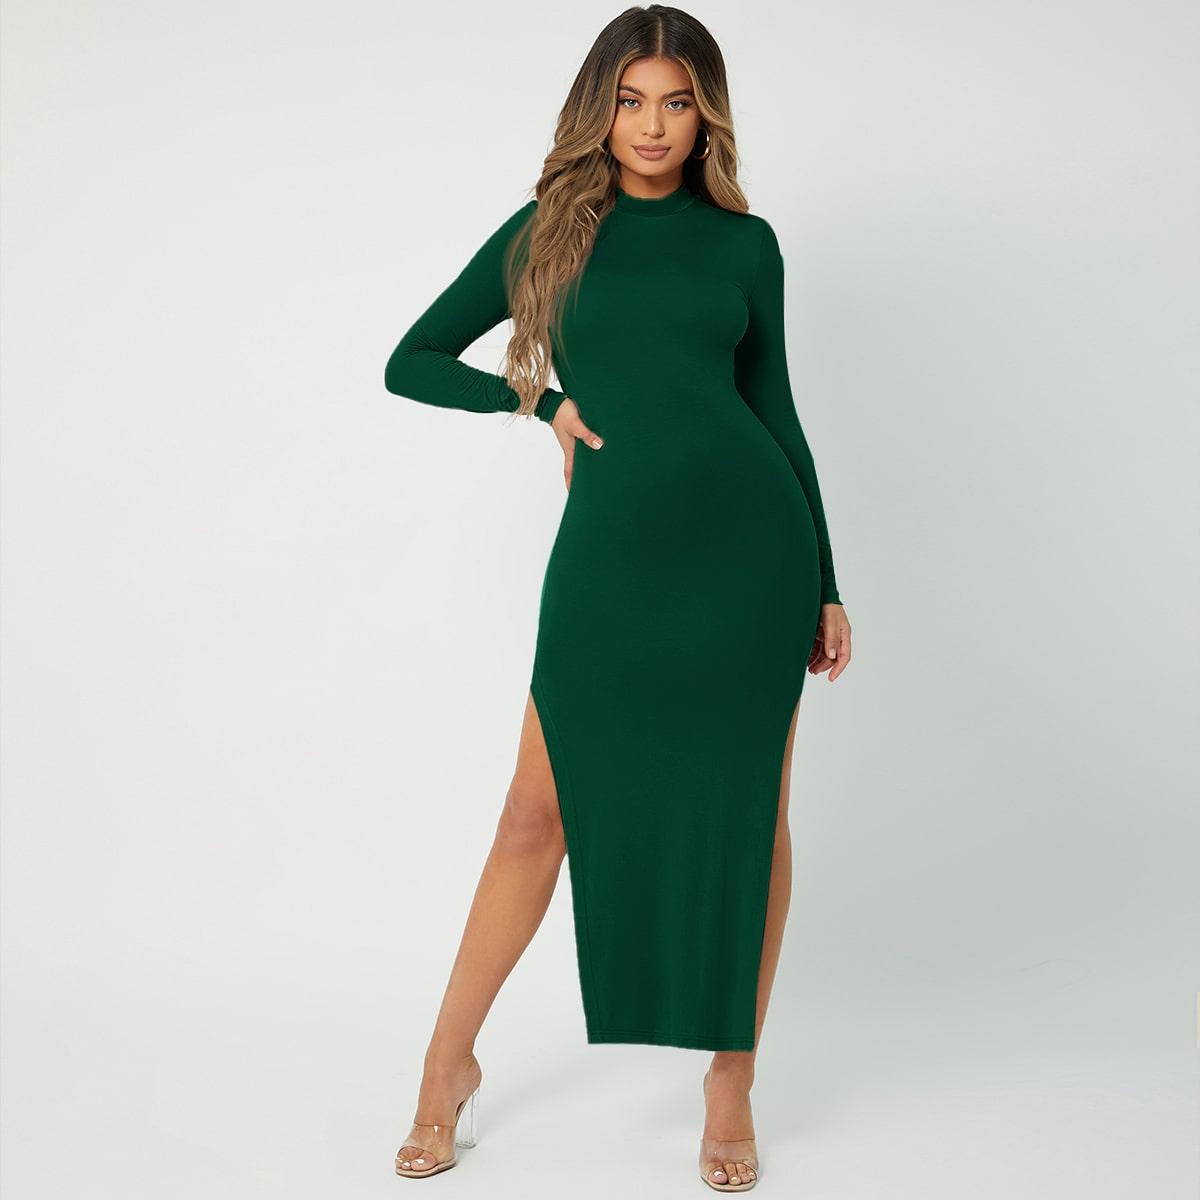 Slit Thigh Mock Neck Bodycon Dress